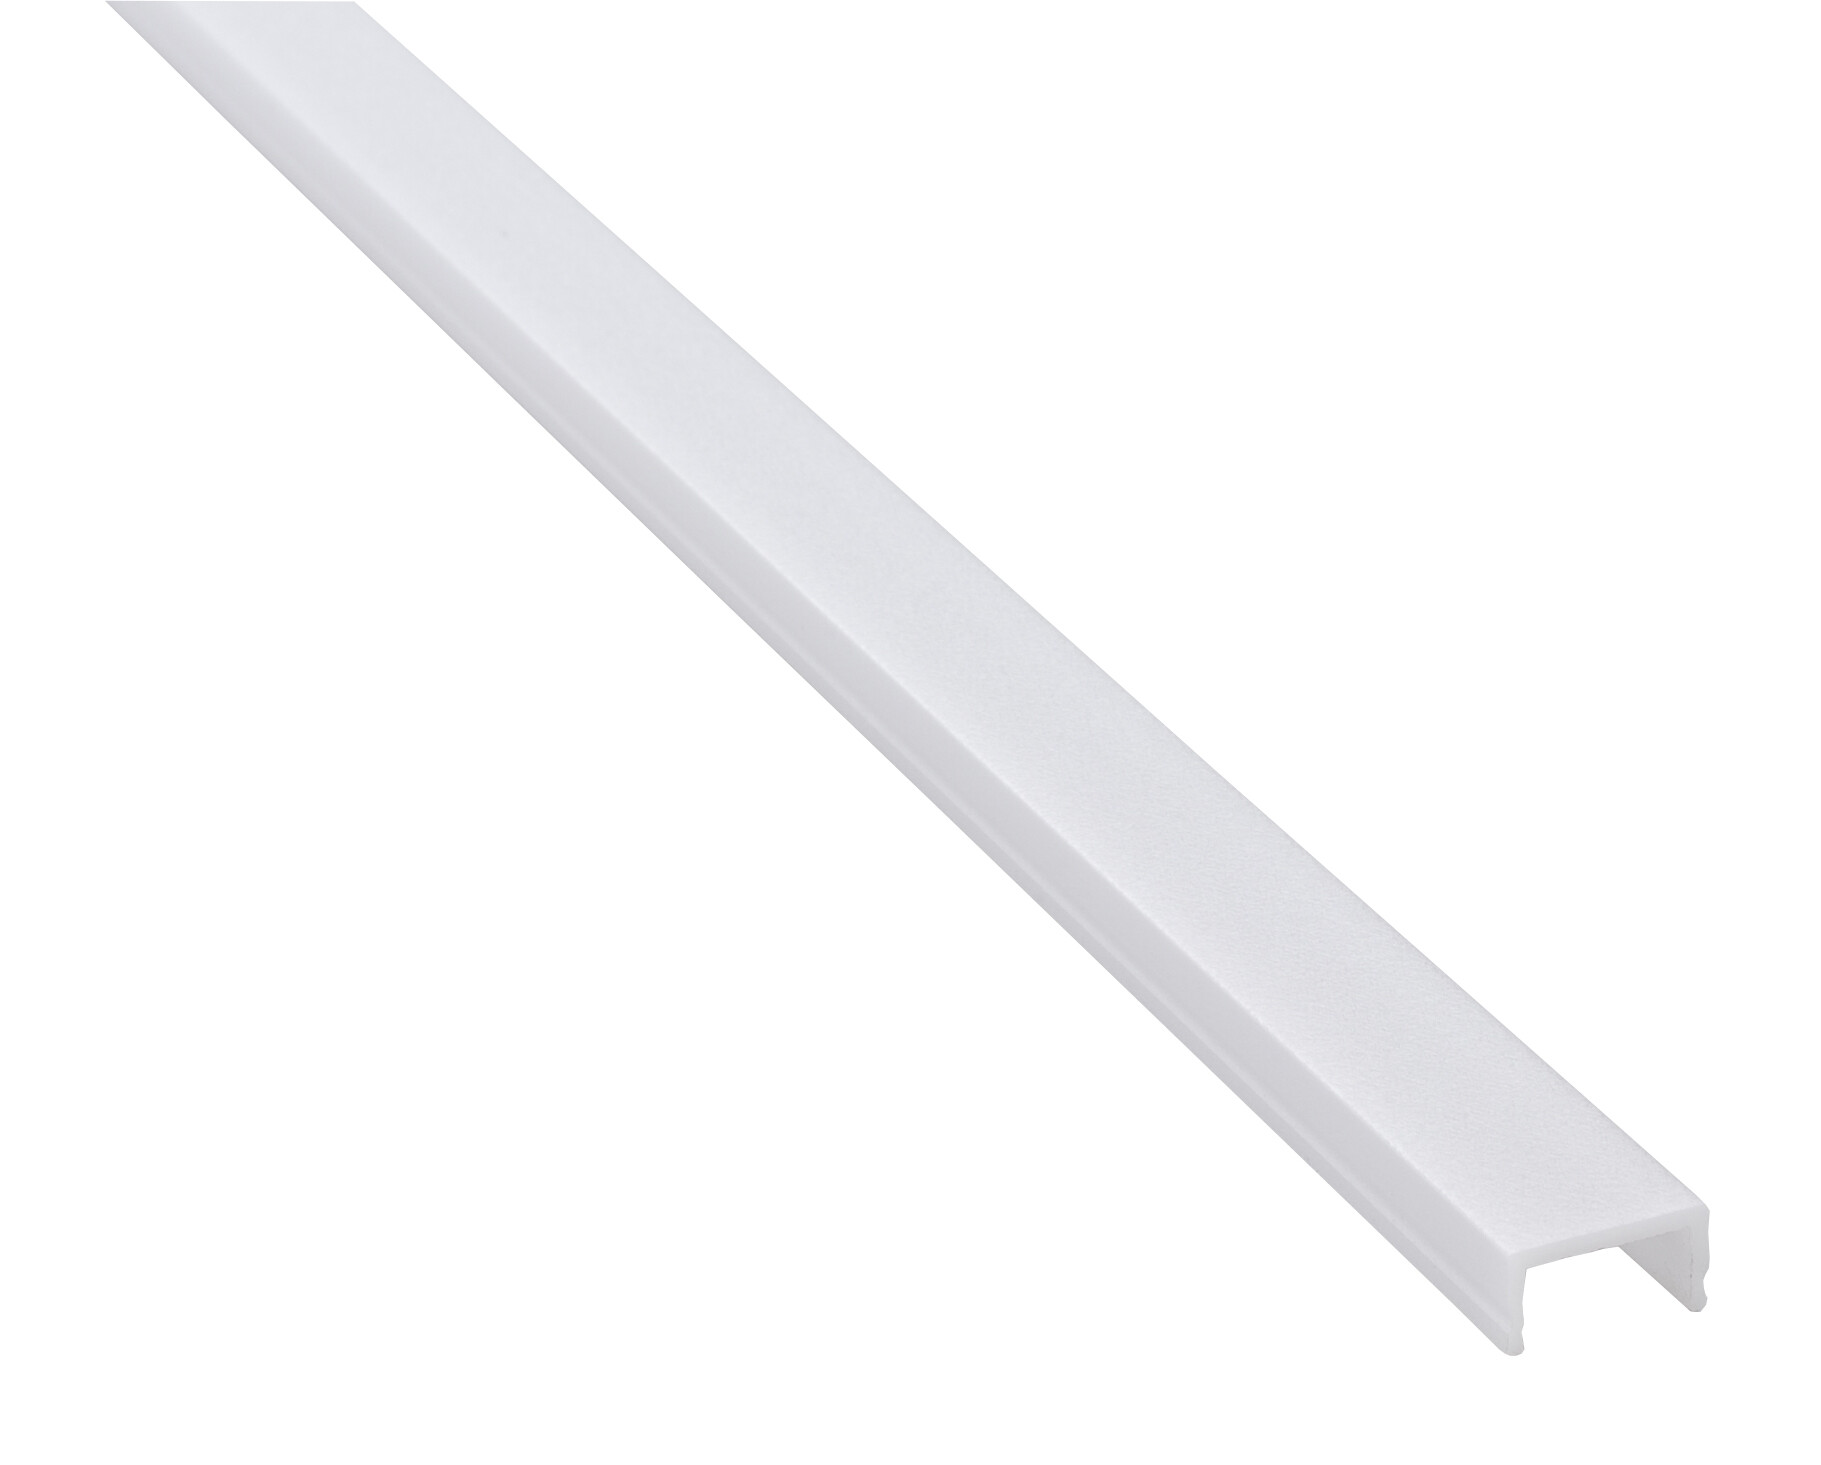 Plexi diffusor voor in/opbouw LED profiel